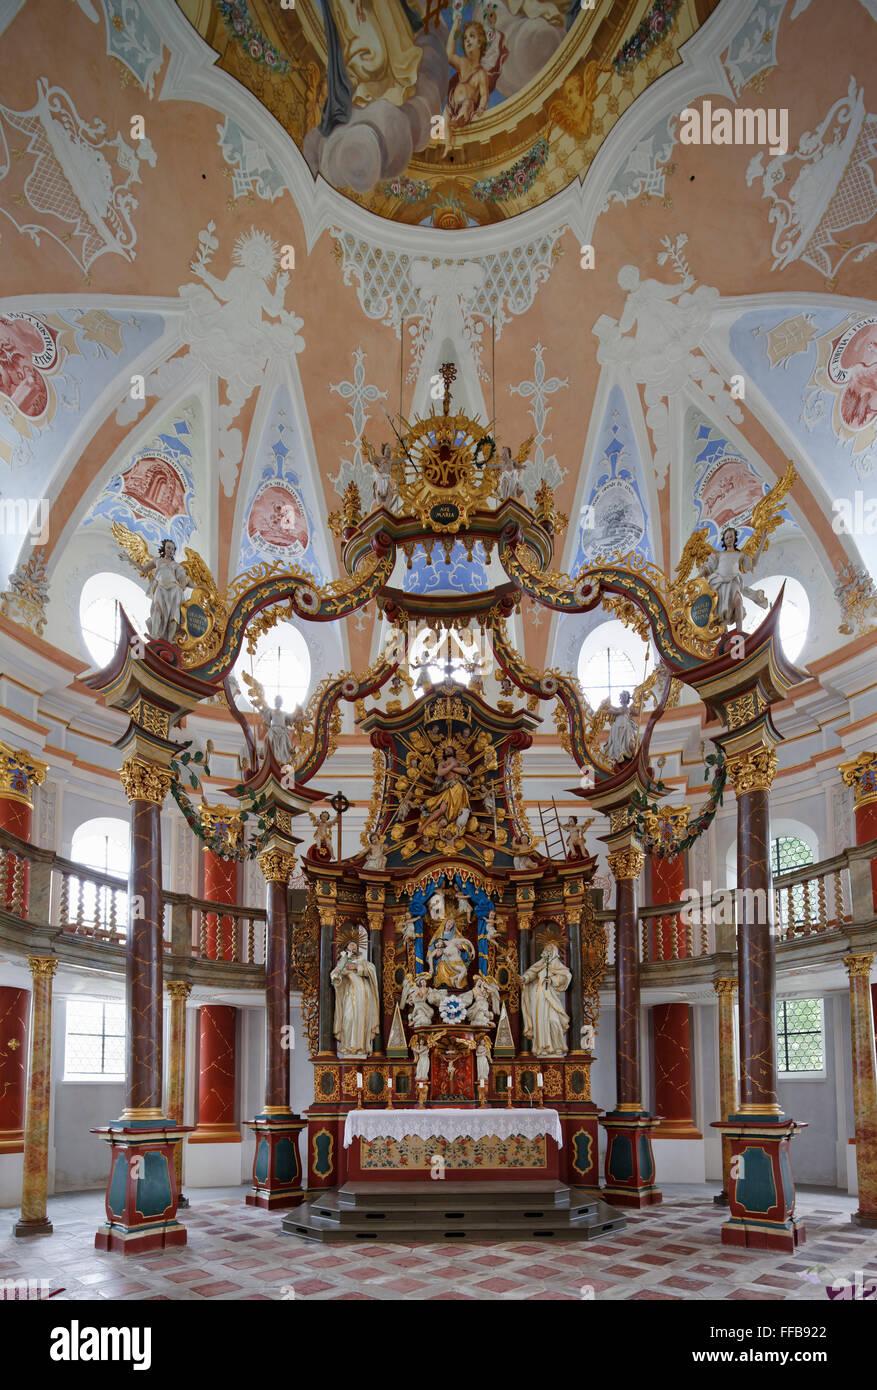 Chancel with the altar, Church St. Johann, Rot an der Rot, Upper Swabia, Swabia, Baden-Württemberg, Germany - Stock Image